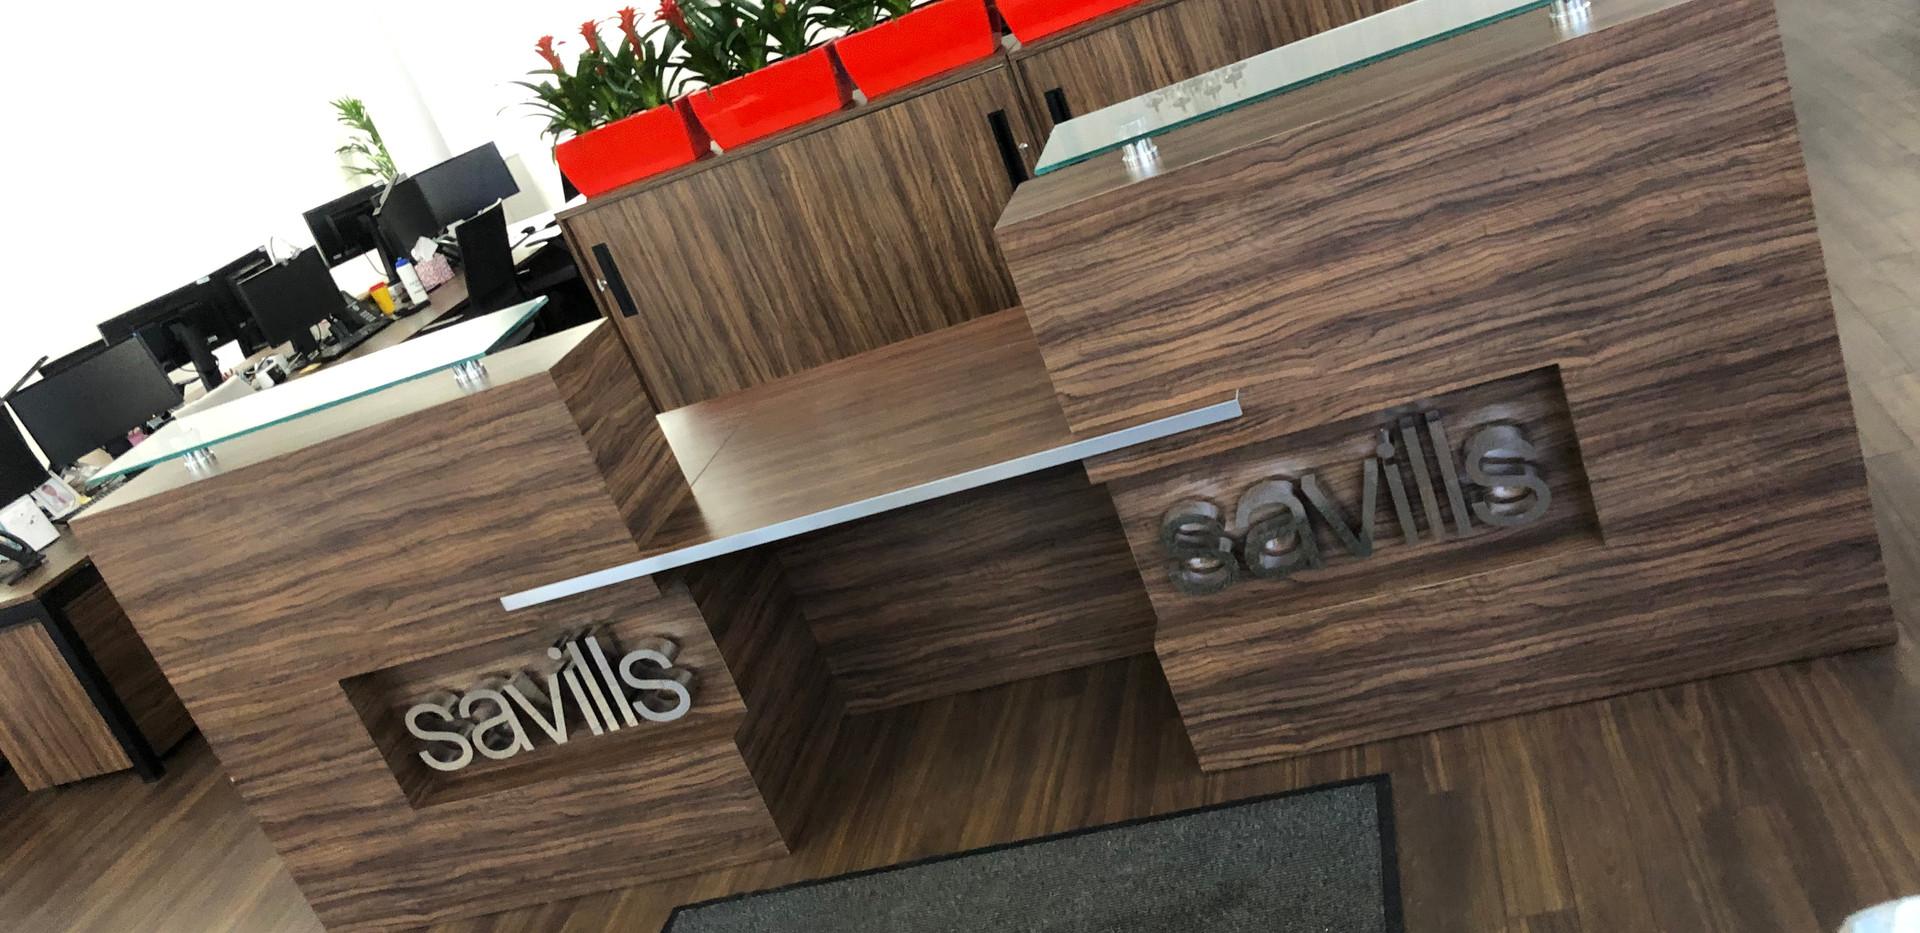 Savills Glasgow.